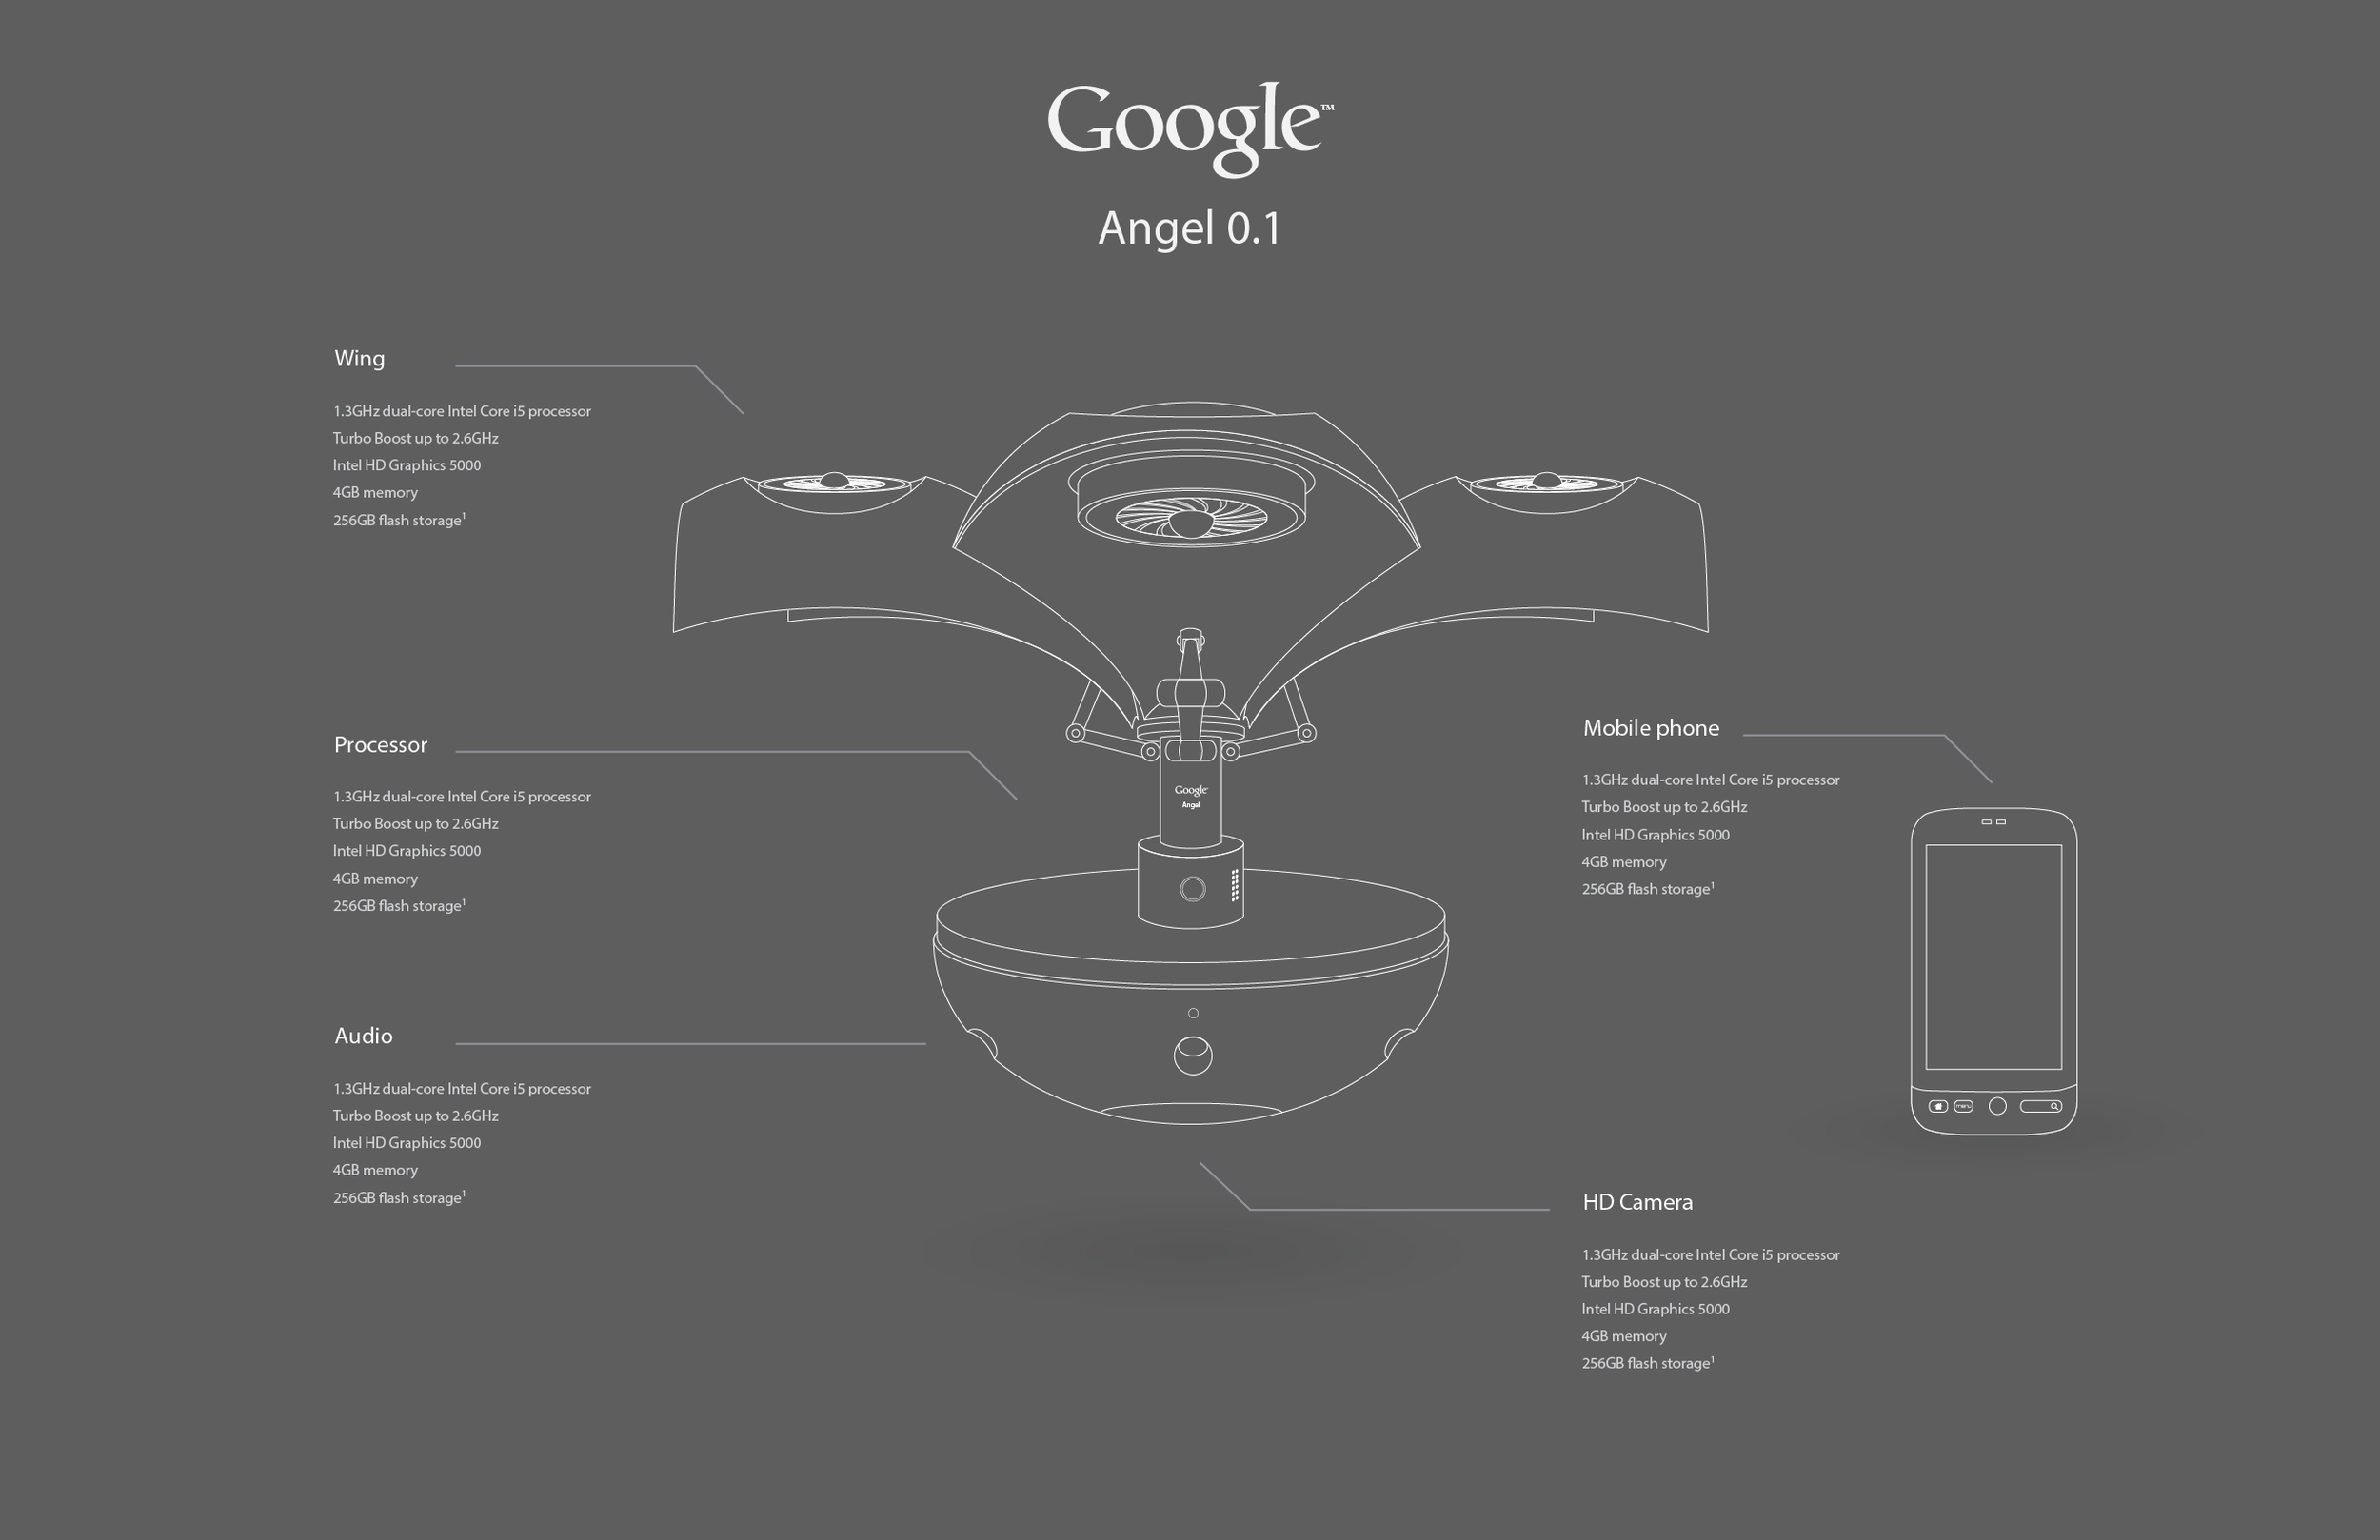 mi-drone-preso_Google-02B.jpg